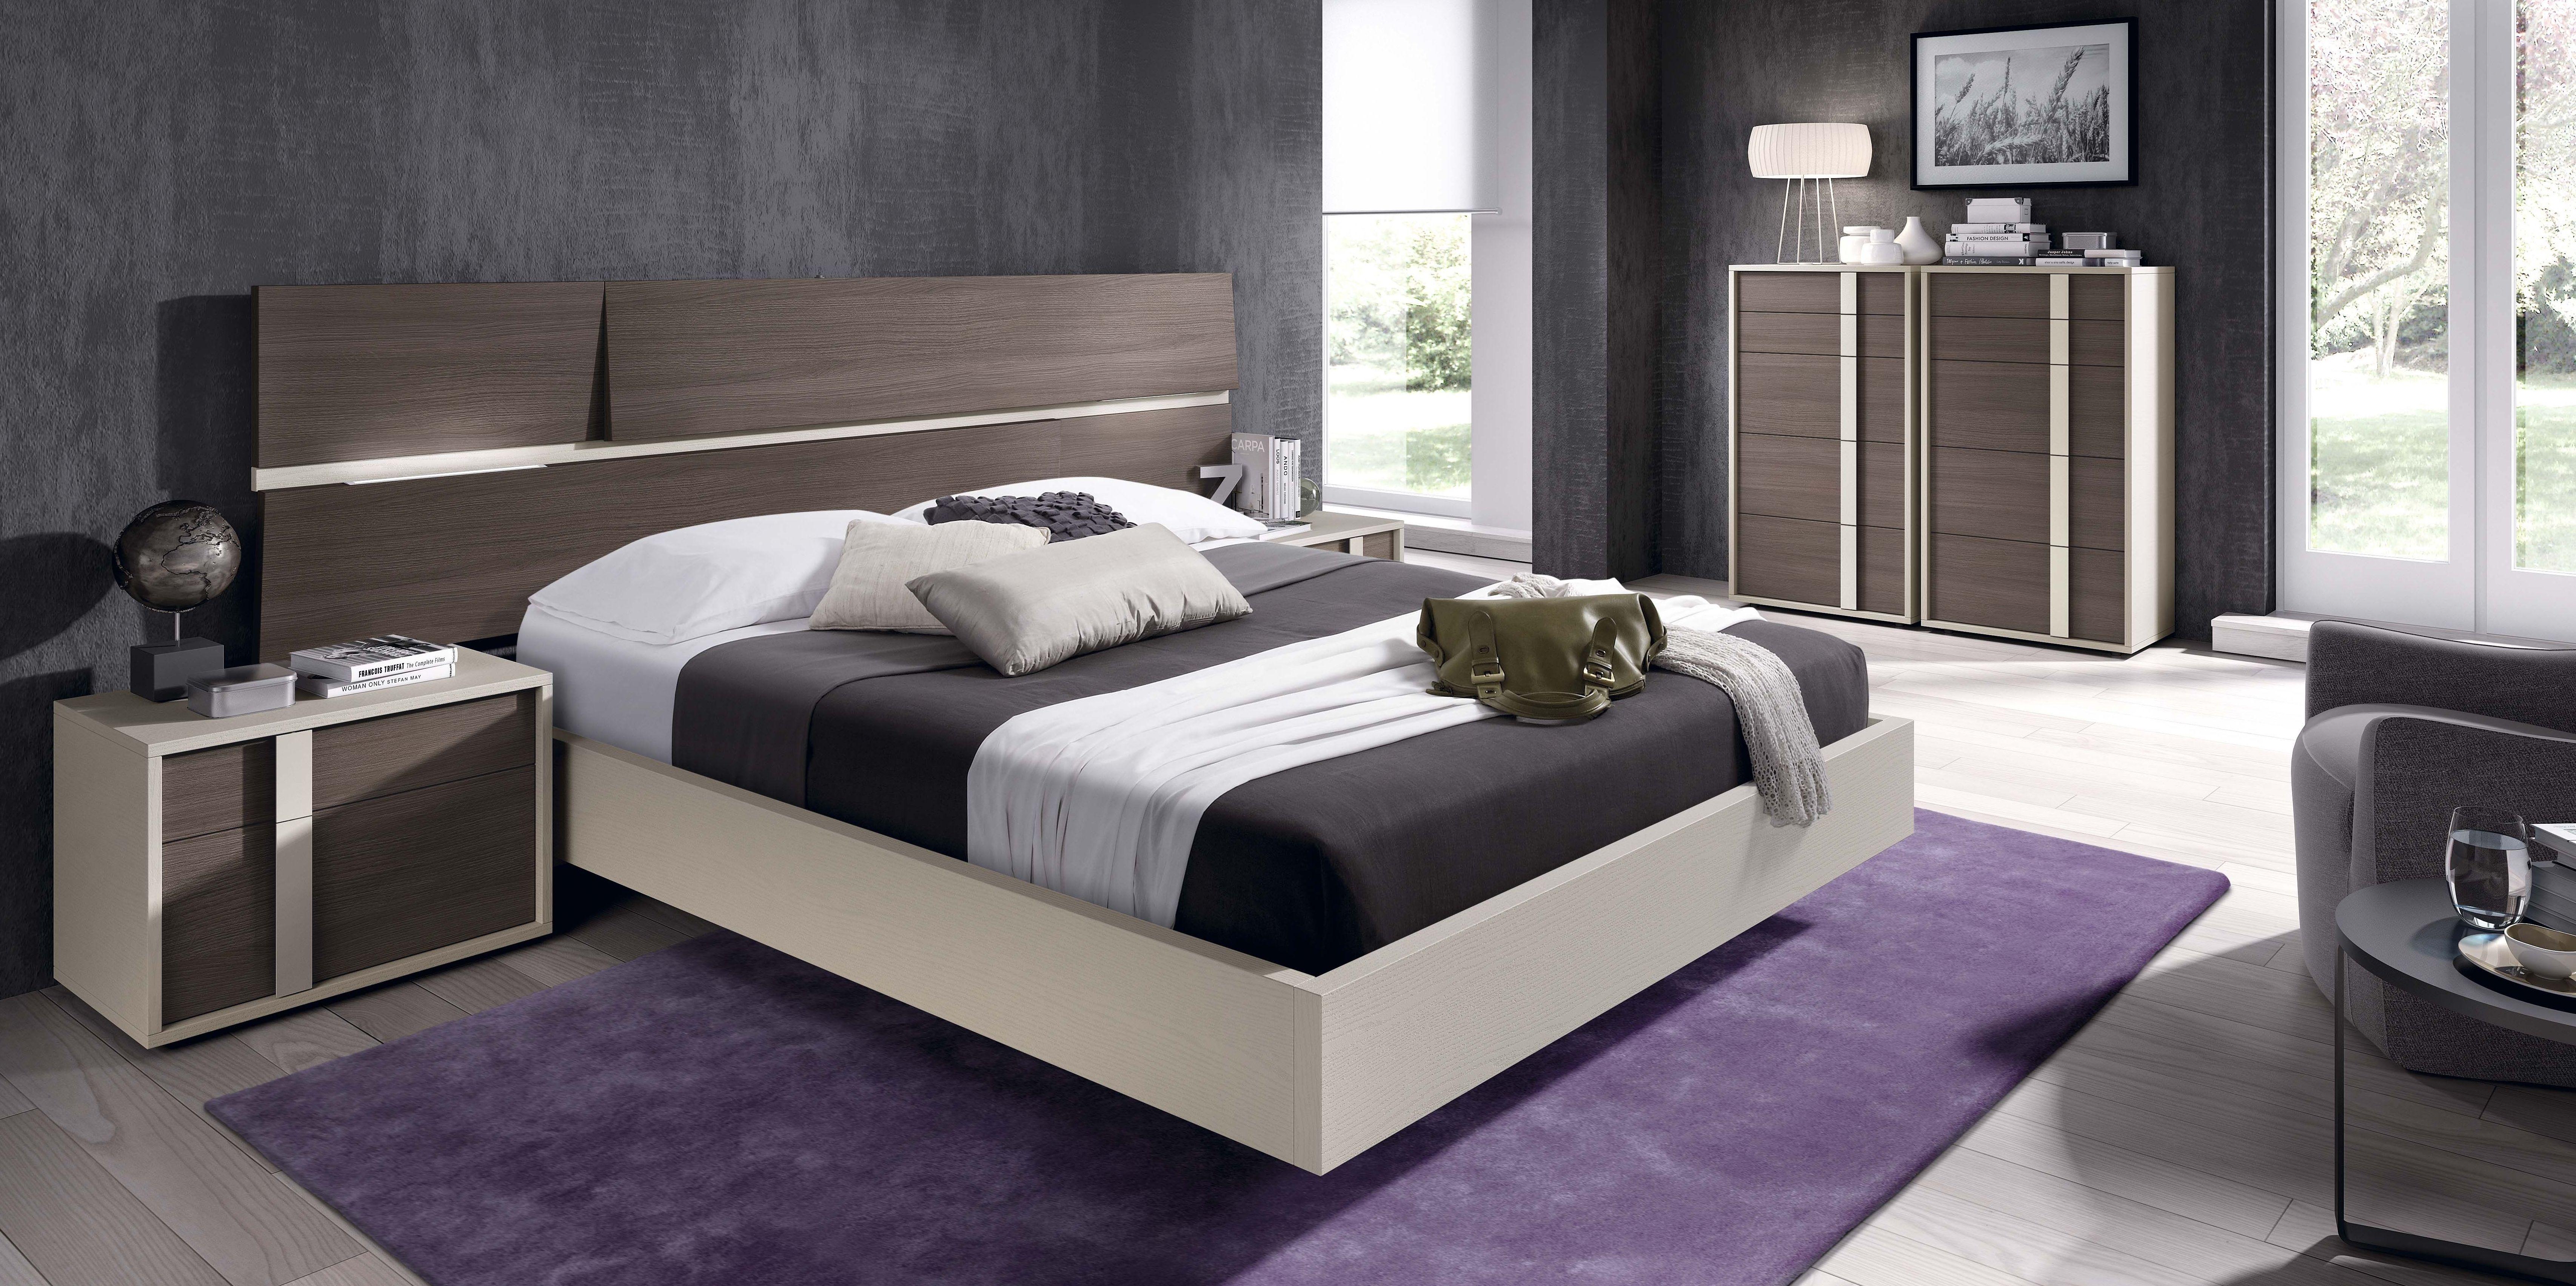 Dormitorio rosamor cat logo de muebles y sof s de goga for Muebles rosamor